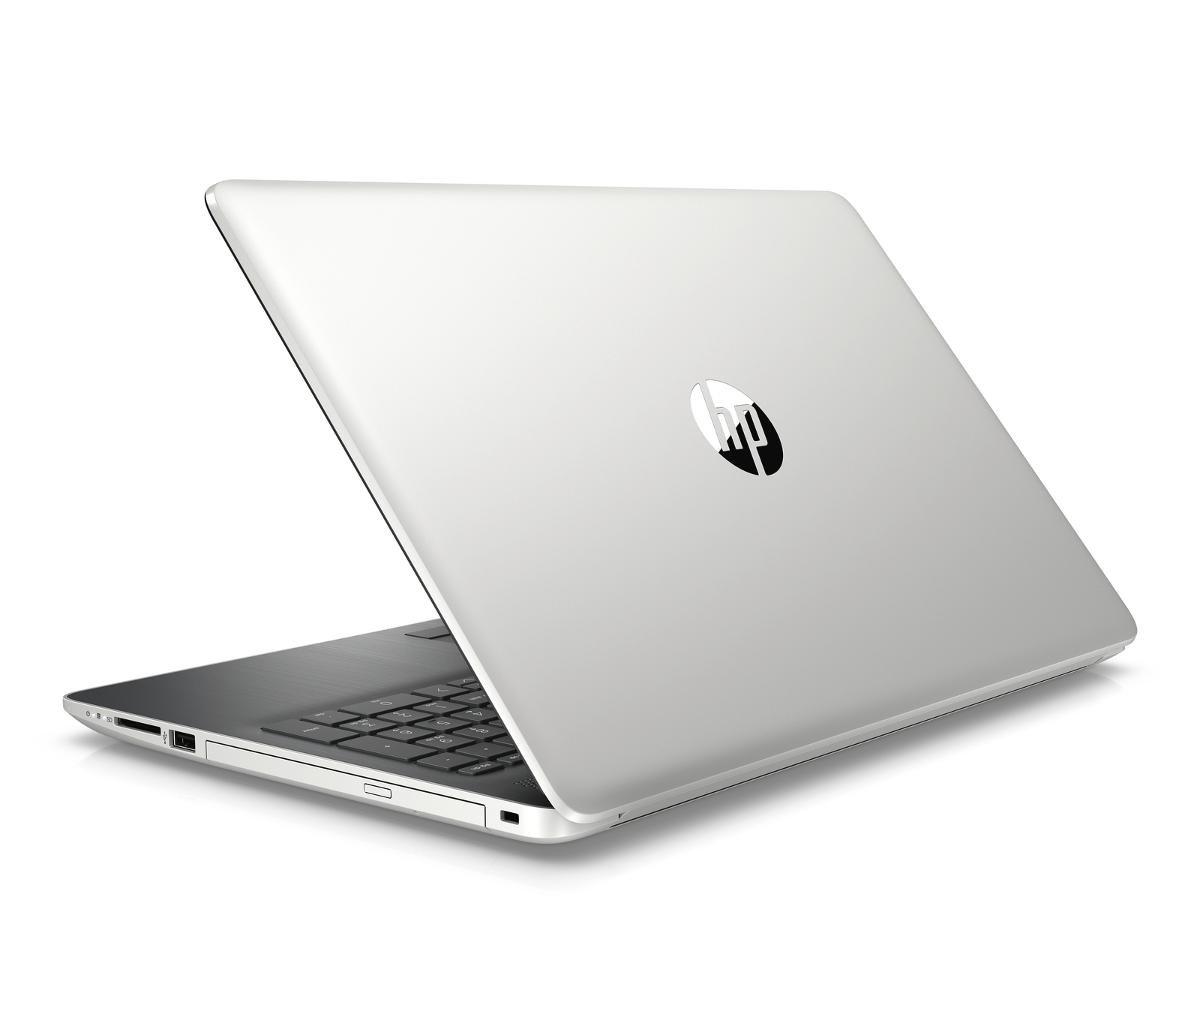 "Laptop HP 15-db0024nw 5KT72EA, Ryzen 5 2500U, 8 GB RAM, 15.6"", 256 GB, Windows 10 Home"